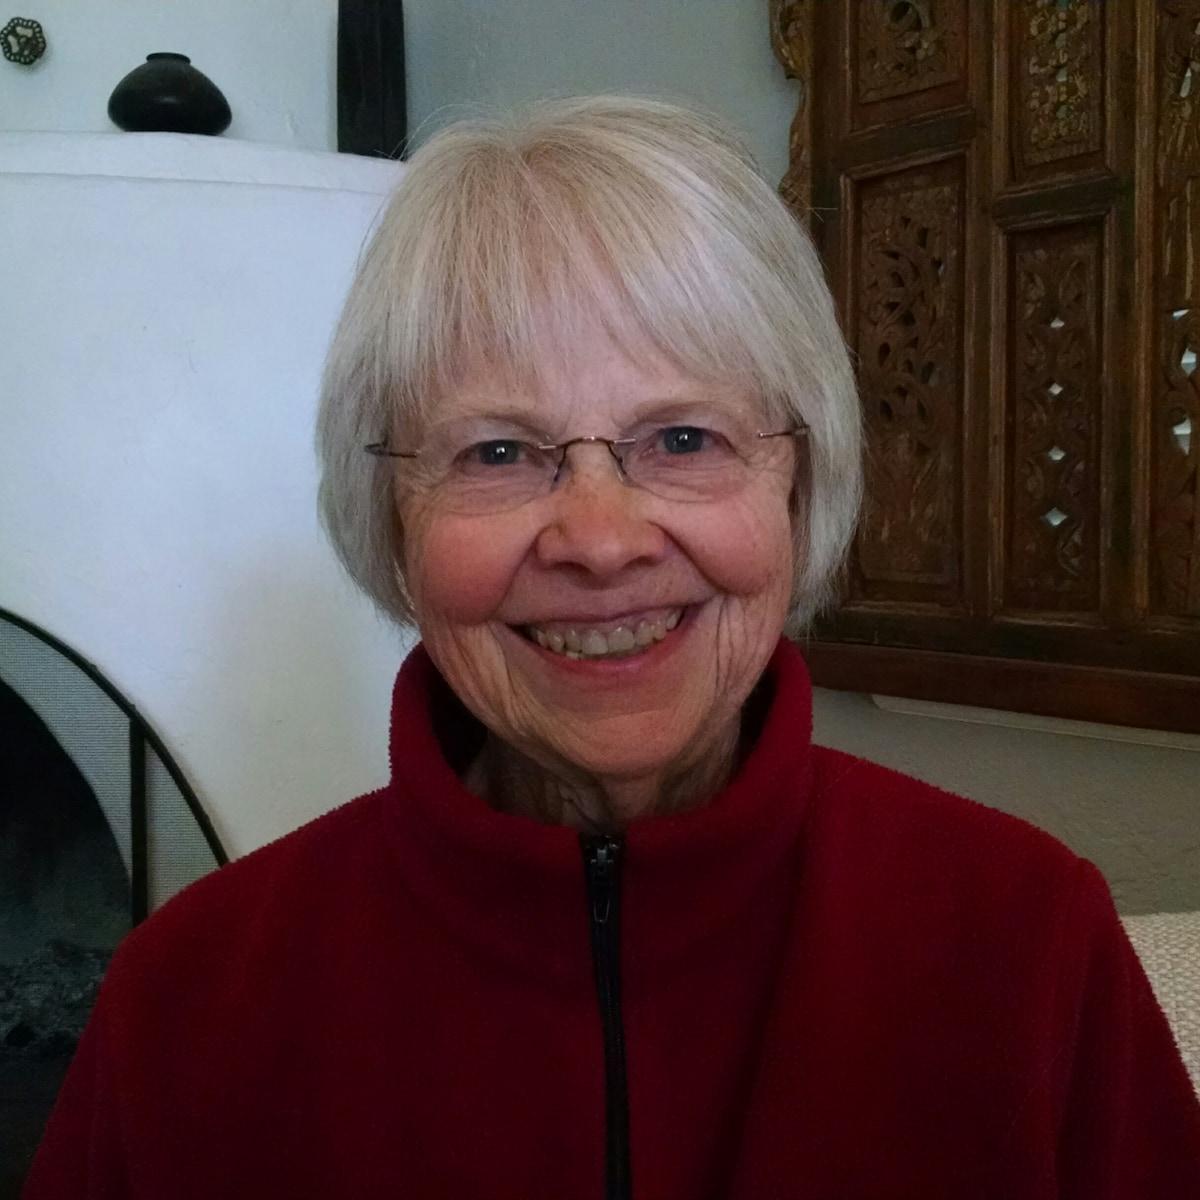 Carol from Albuquerque